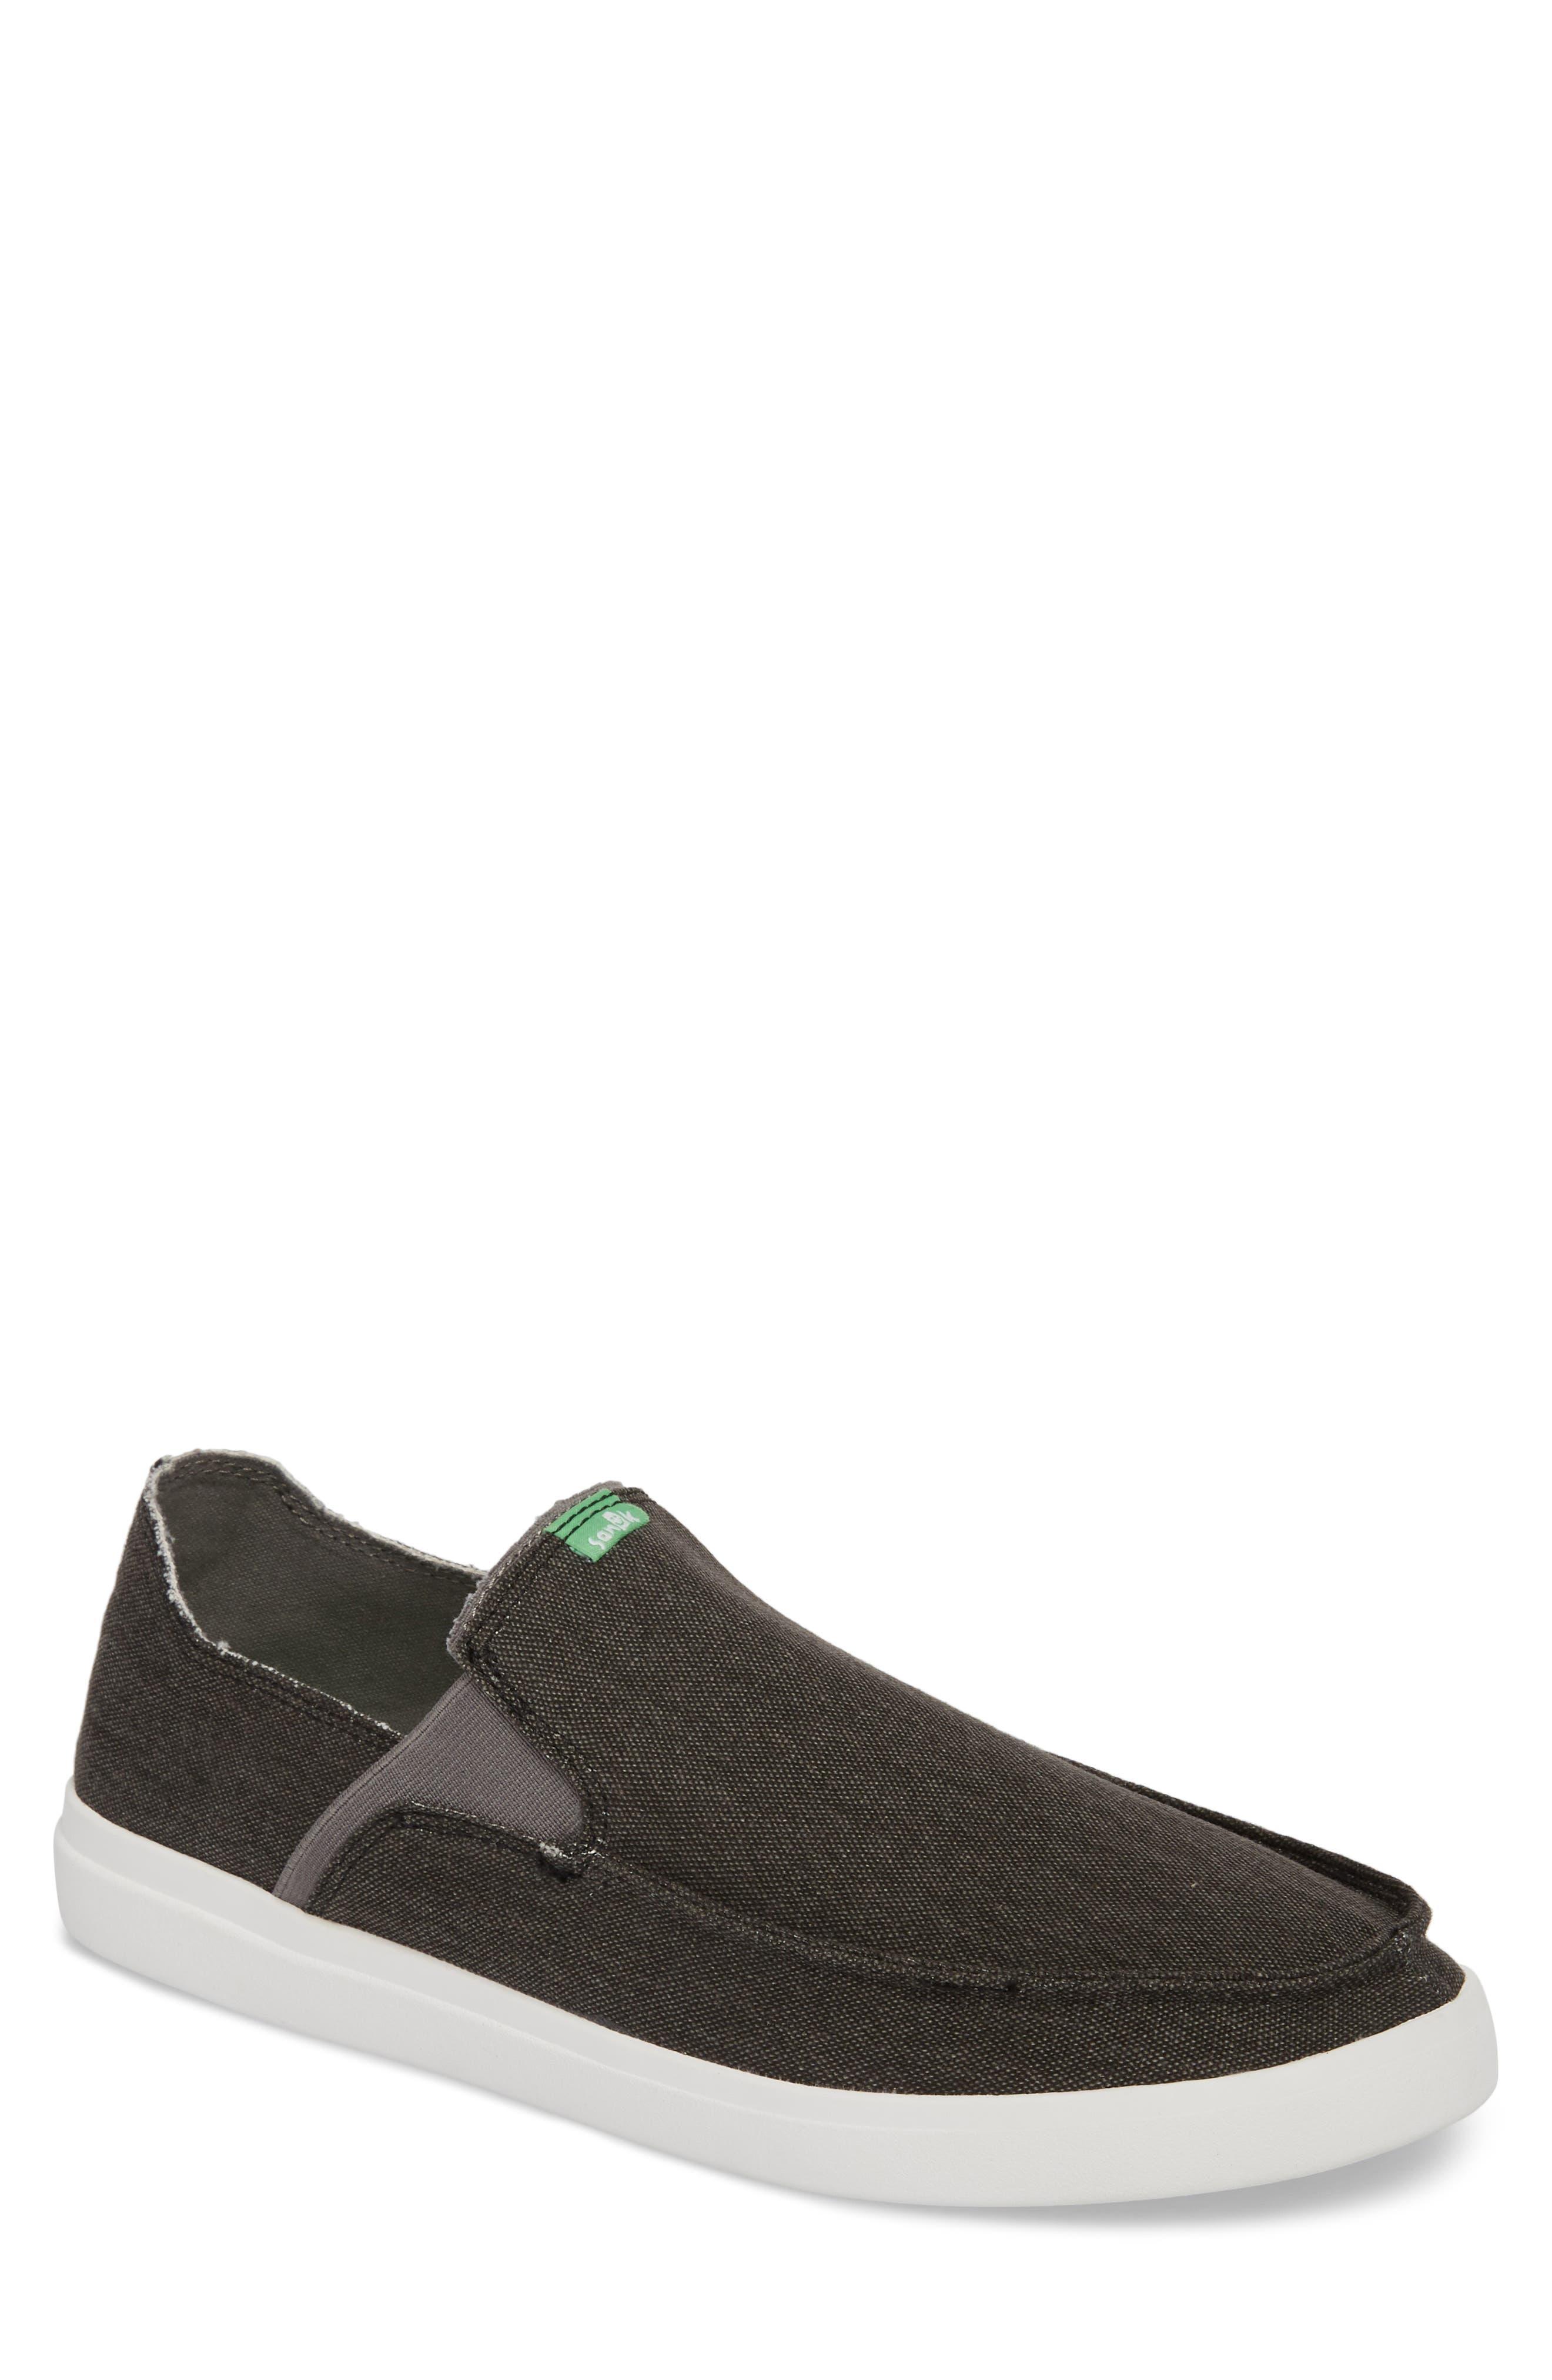 Pickpocket Slip-On Sneaker,                             Main thumbnail 1, color,                             BLACK